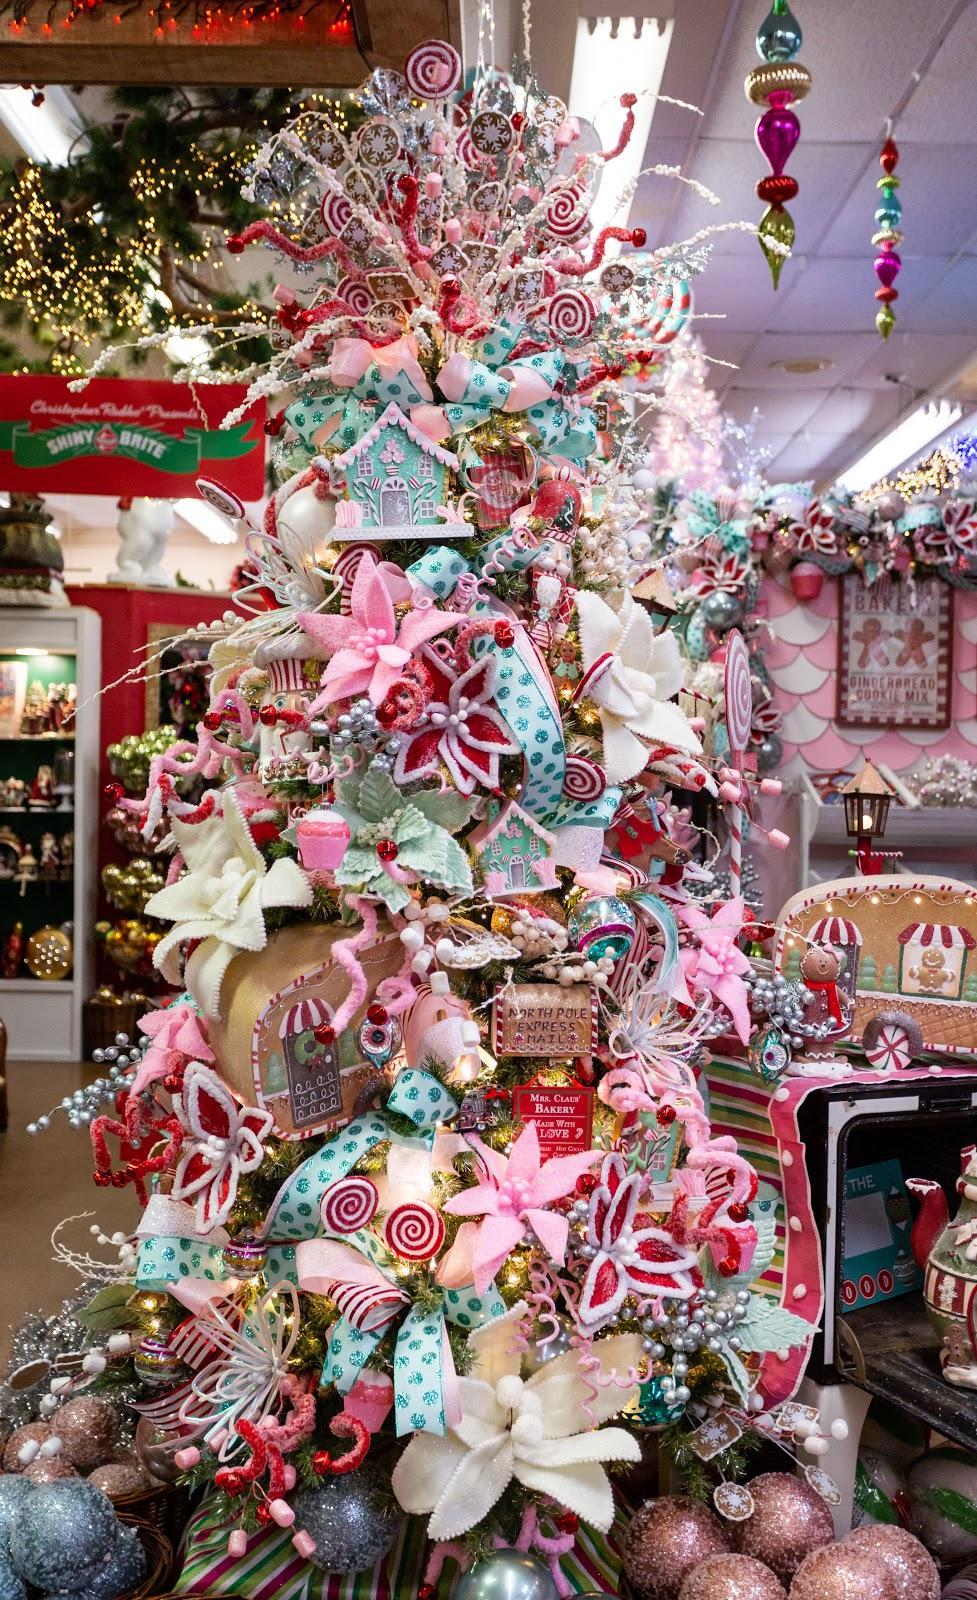 Christmas Decorating Trends 2020: χριστουγεννιάτικο δέντρο με ζαχαρωτά